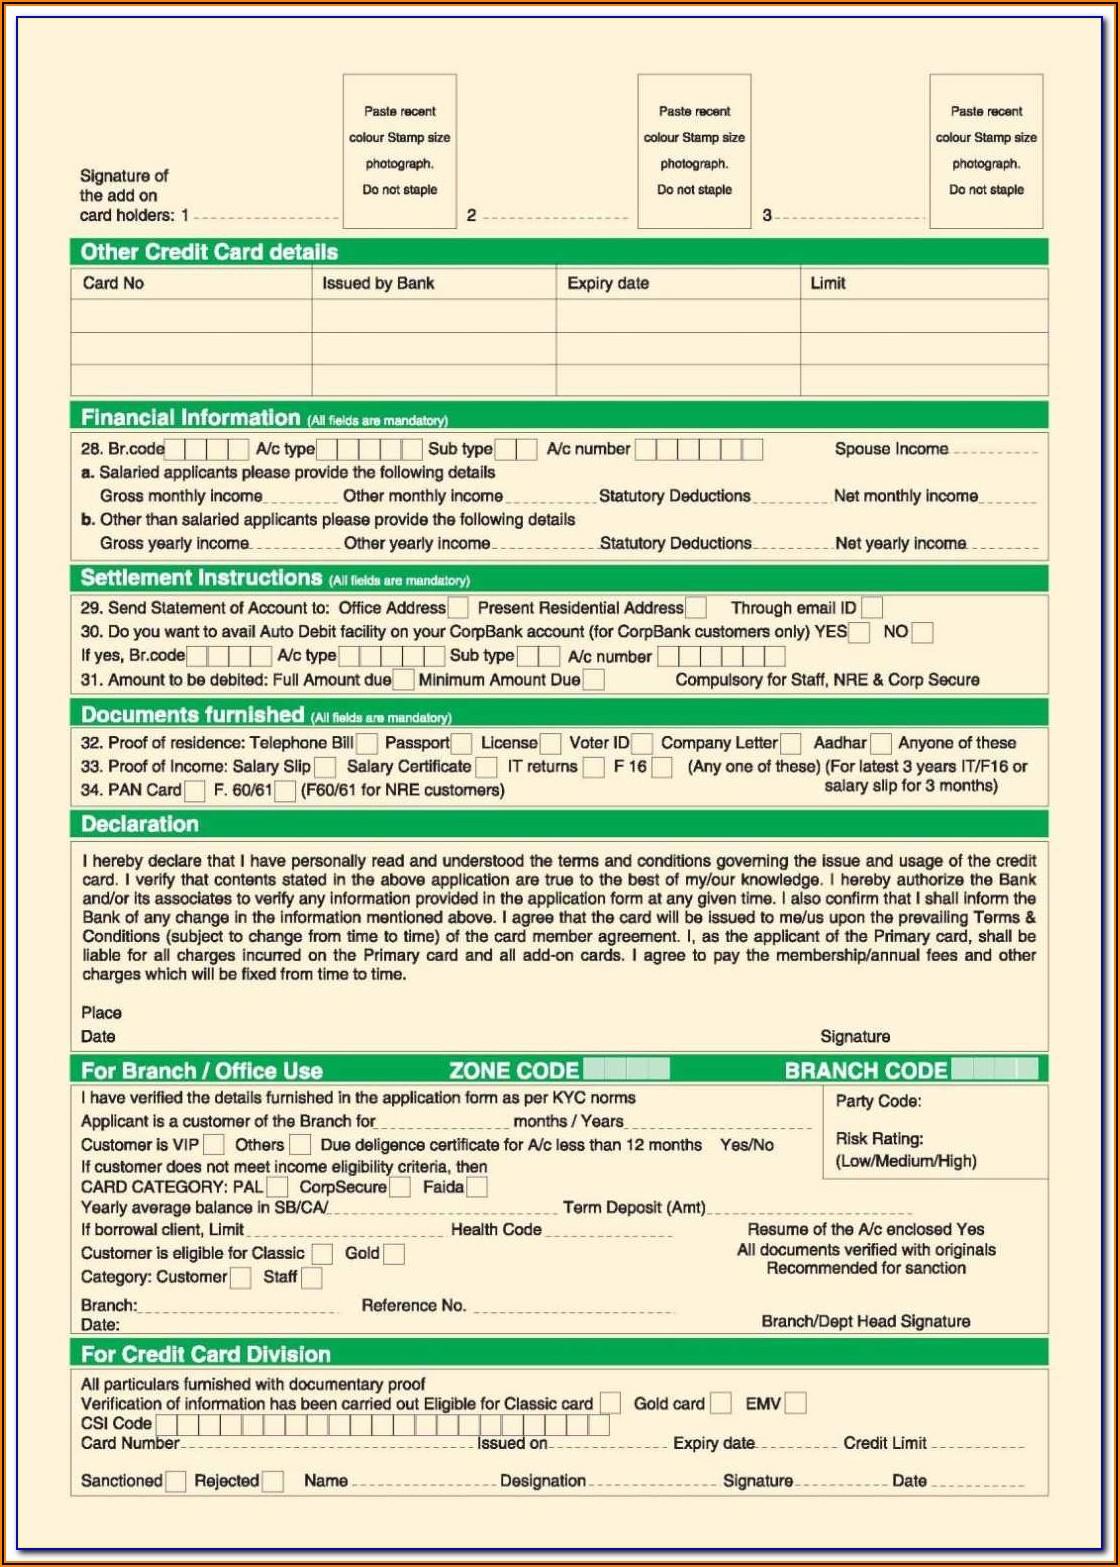 Union Bank Credit Card Application Form